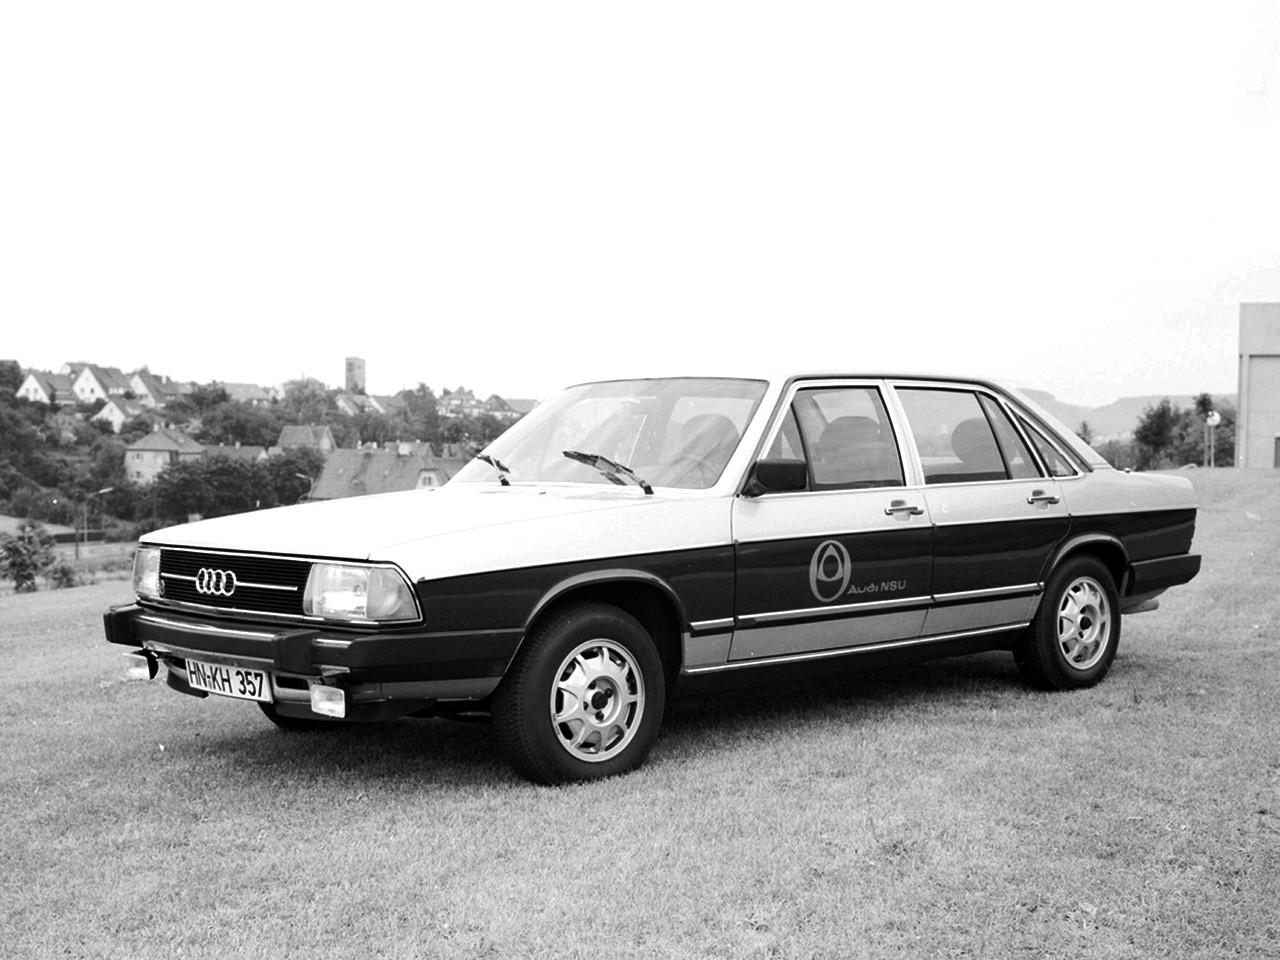 AUDI 100 (C2) specs & photos - 1976, 1977, 1978, 1979, 1980, 1981, 1982 - autoevolution